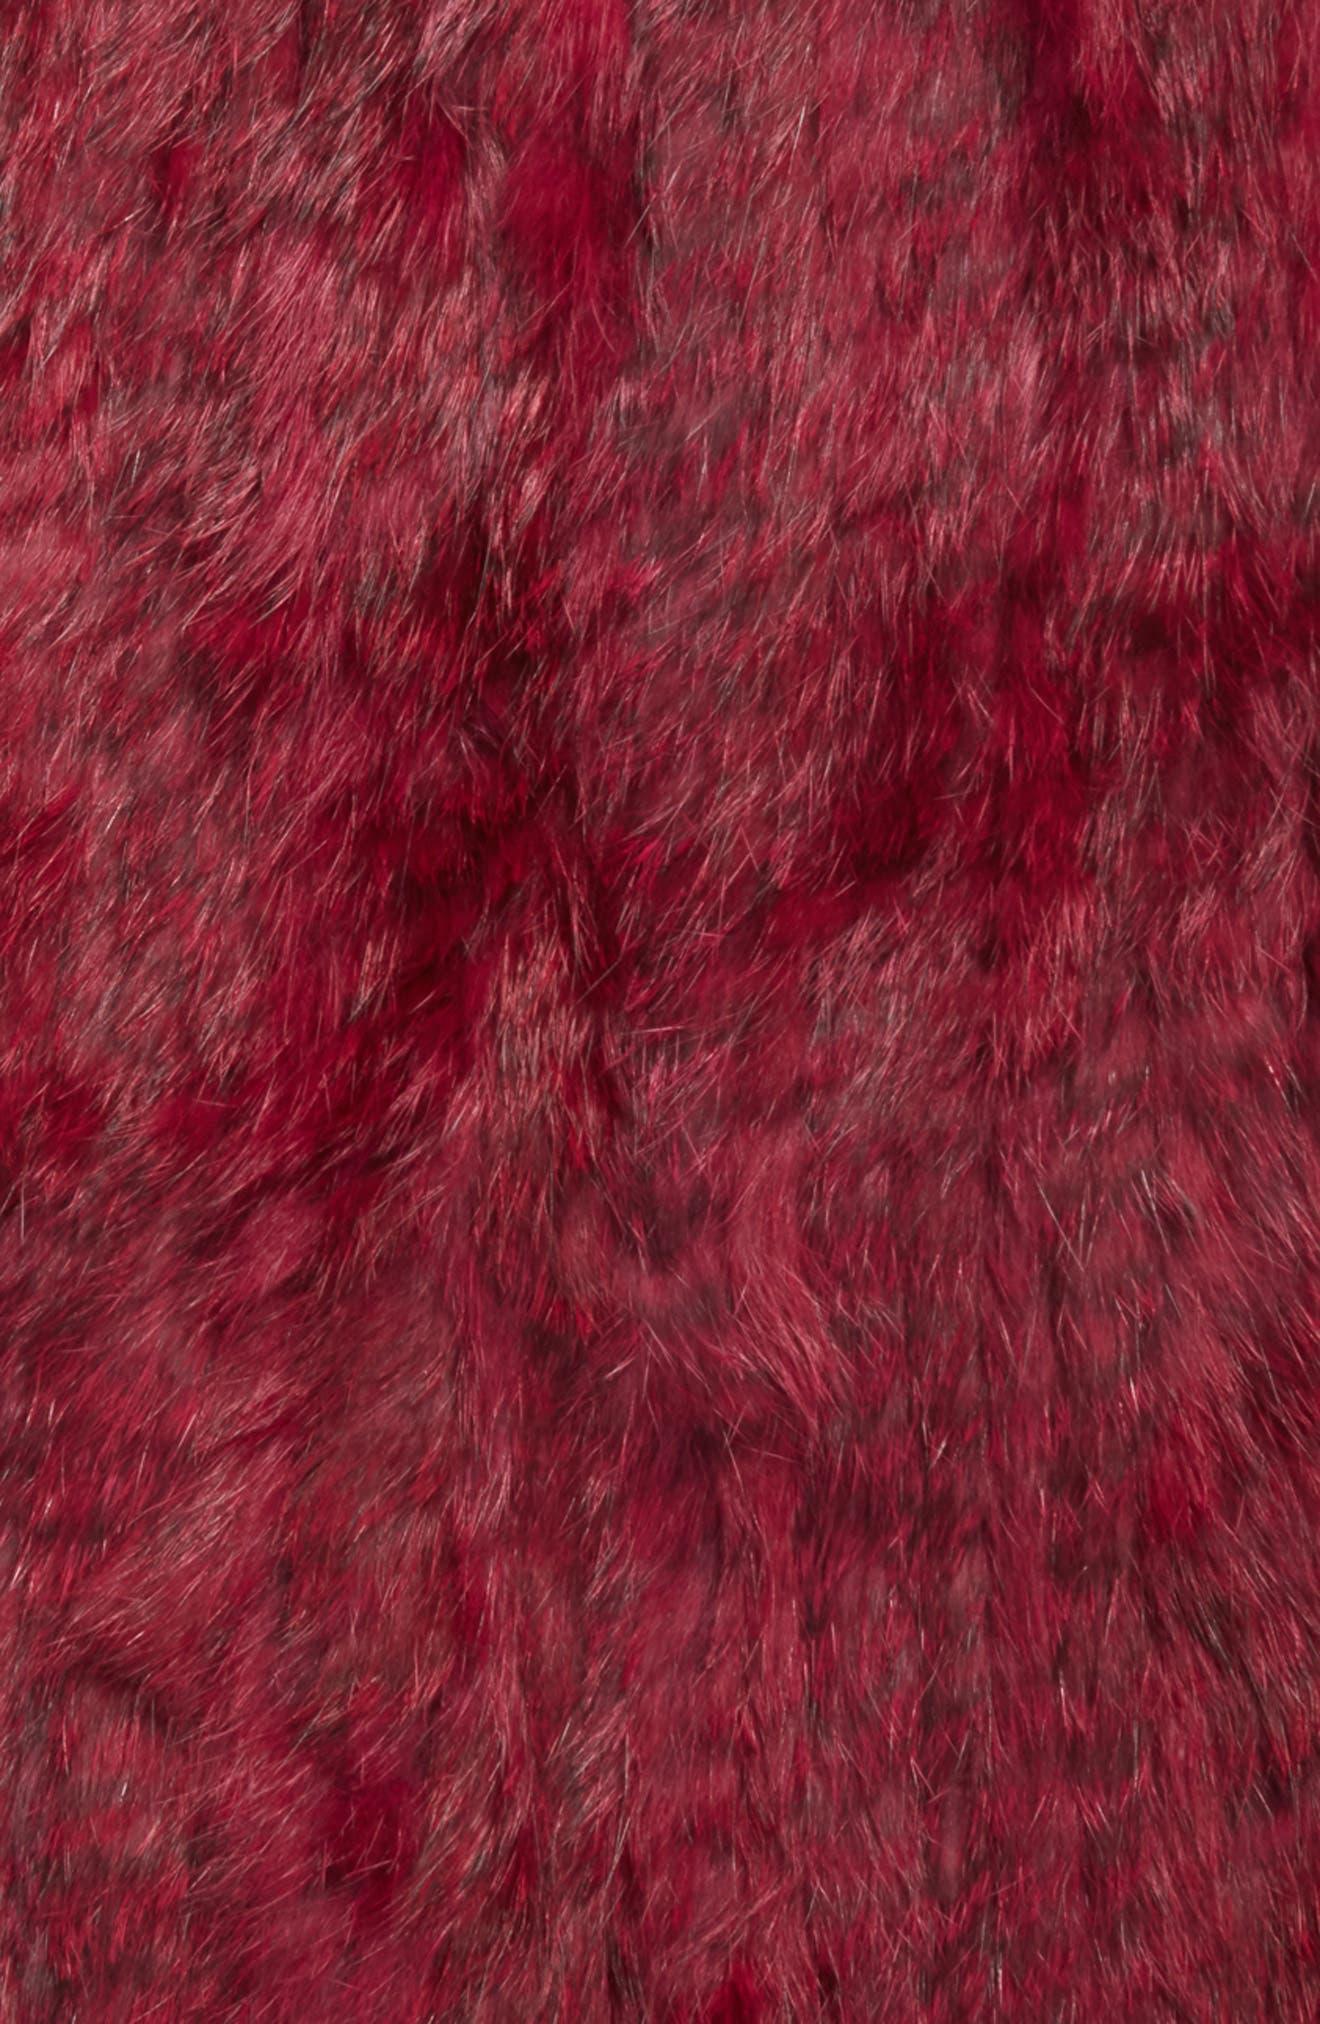 Overdyed Genuine Rabbit Fur Infinity Scarf,                             Alternate thumbnail 4, color,                             930